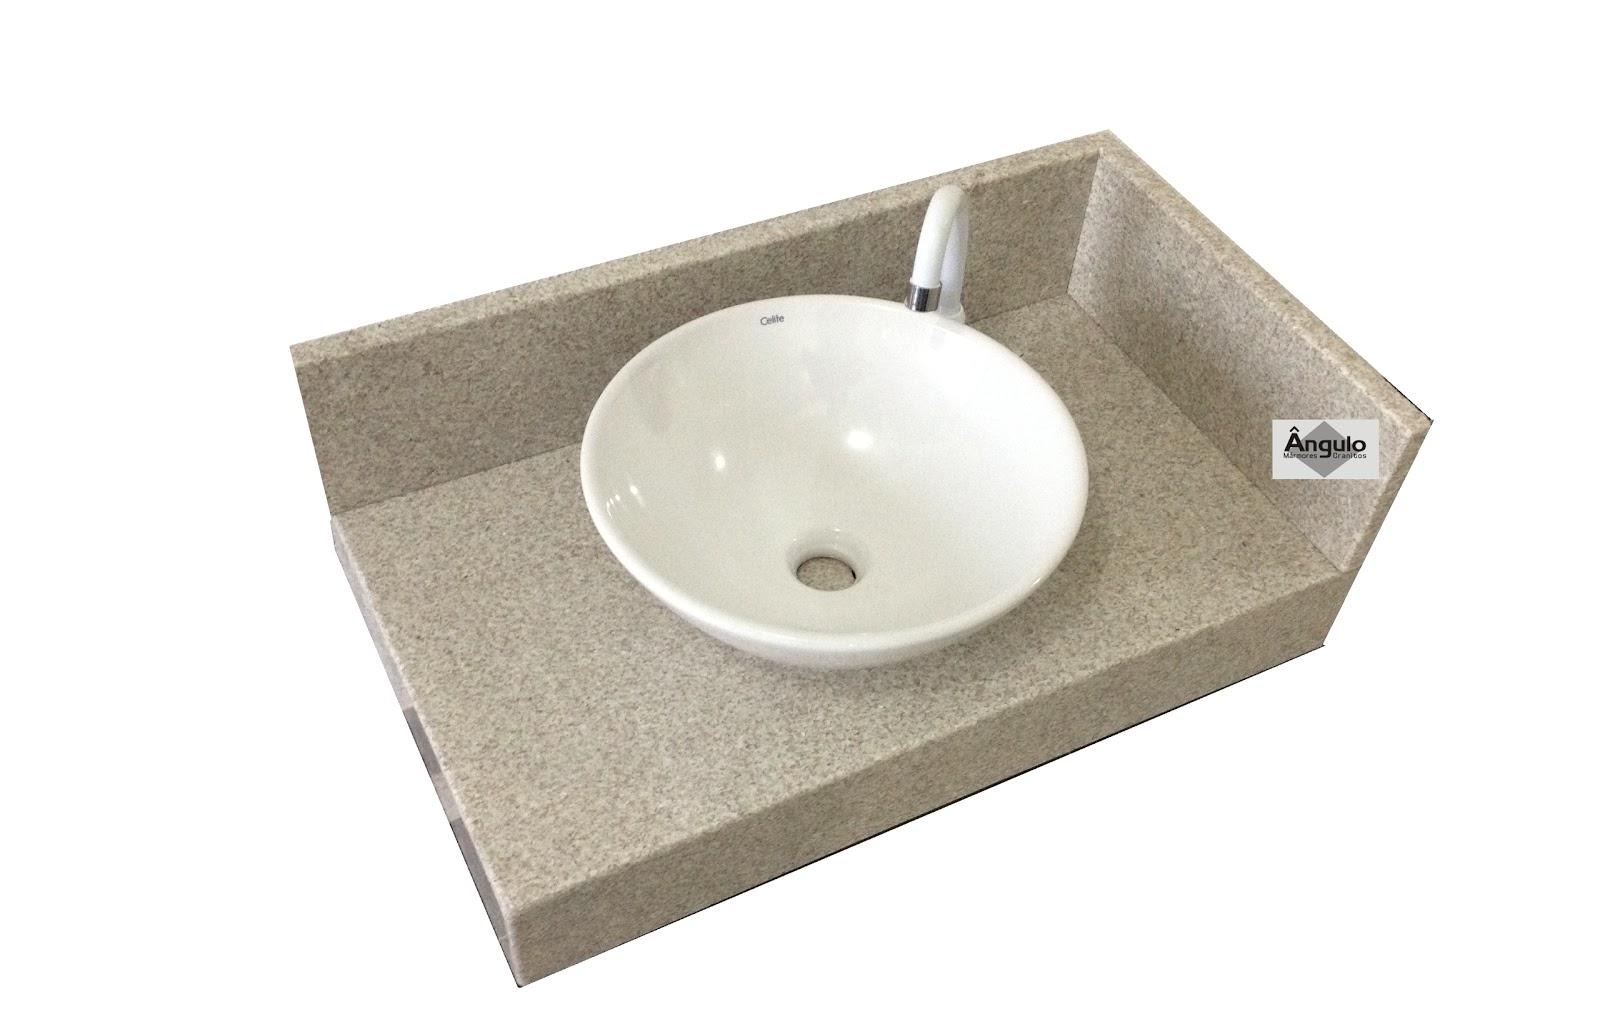 Mármores e Granitos: Bancada de Banheiro Granito Branco Siena #776B54 1600x1014 Banheiro Branco Siena